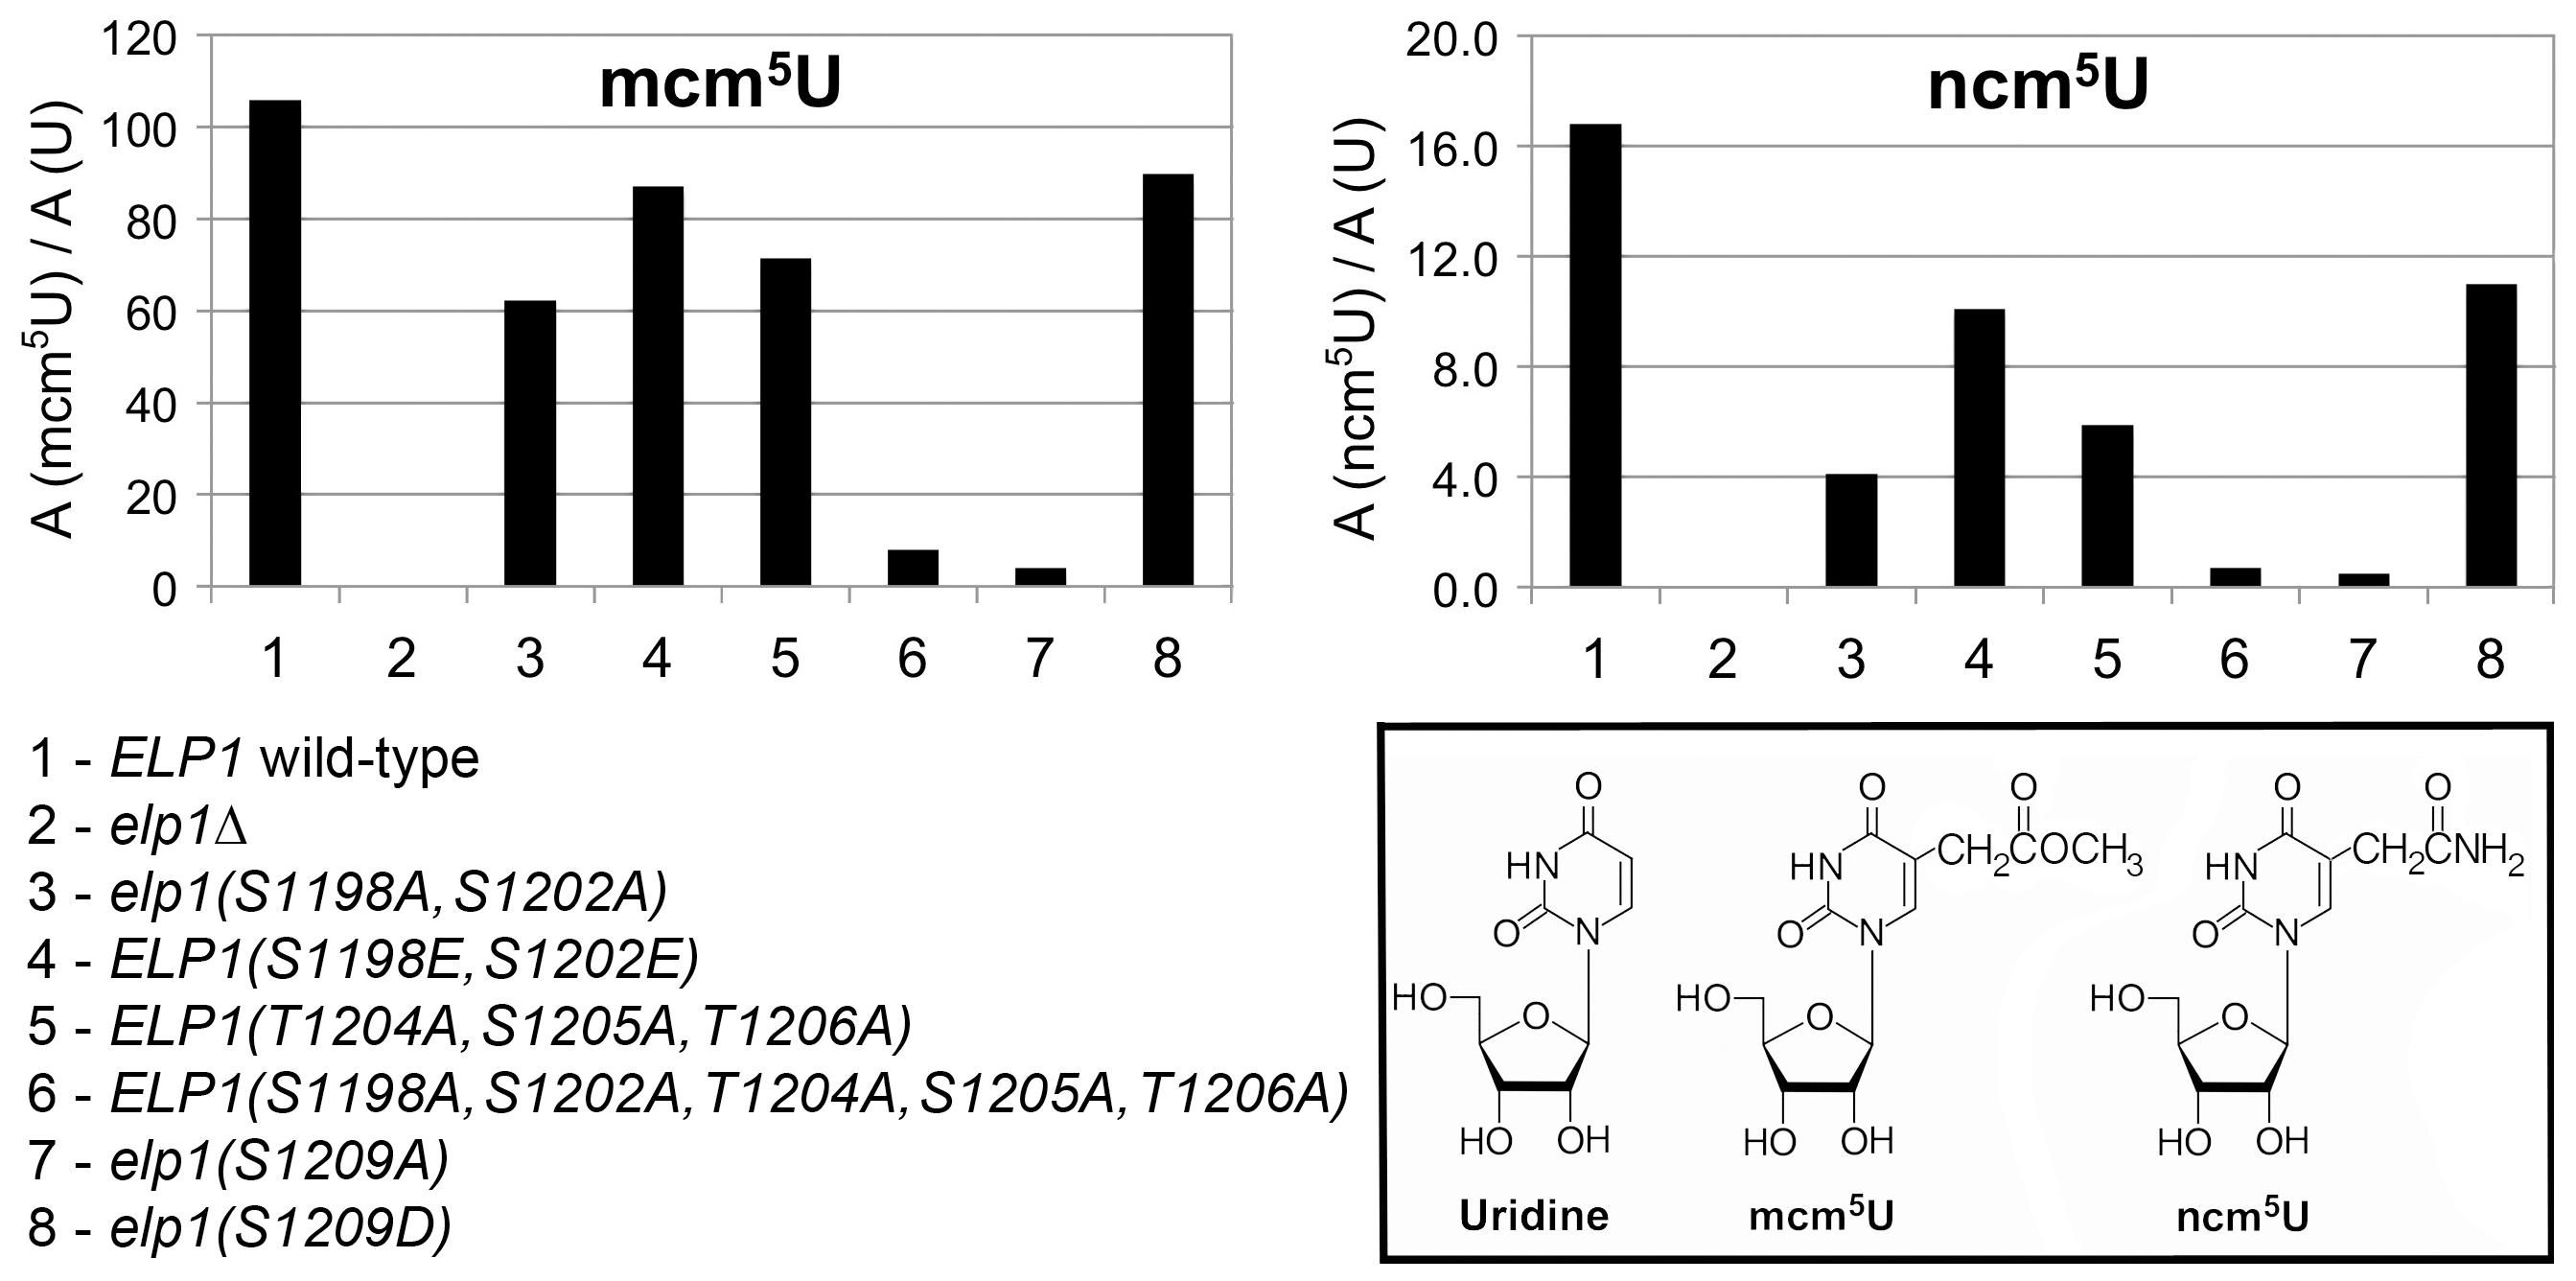 Quantitation of modified U34 nucleosides in tRNA from selected <i>elp1</i> mutants.